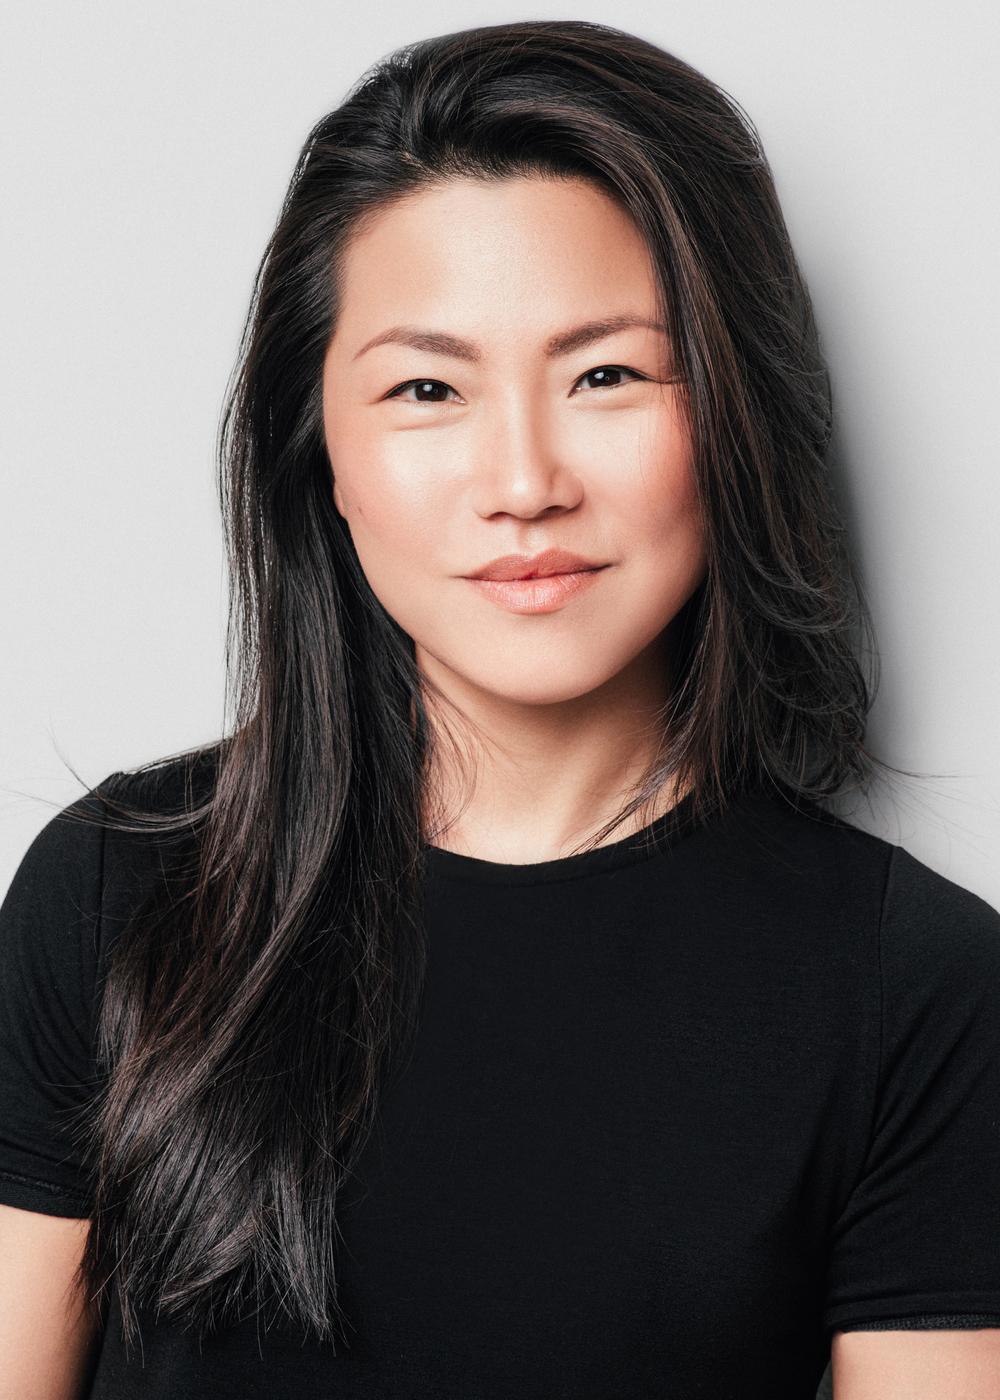 CEO-portrait-corporate-headshot-03.jpg